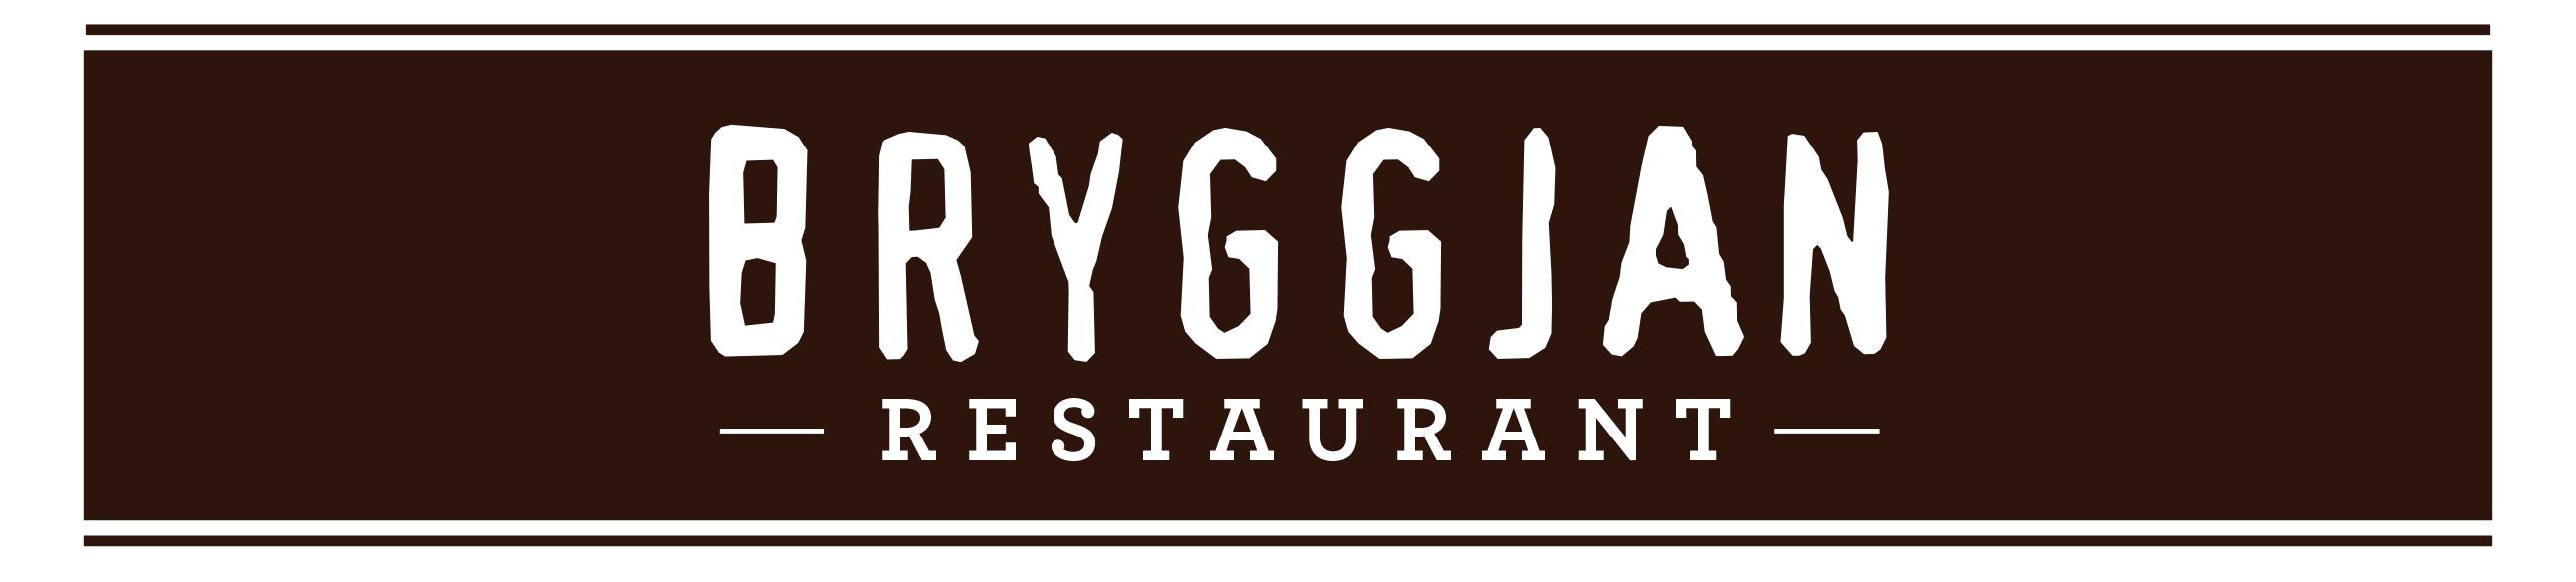 Bryggjan Restaurant